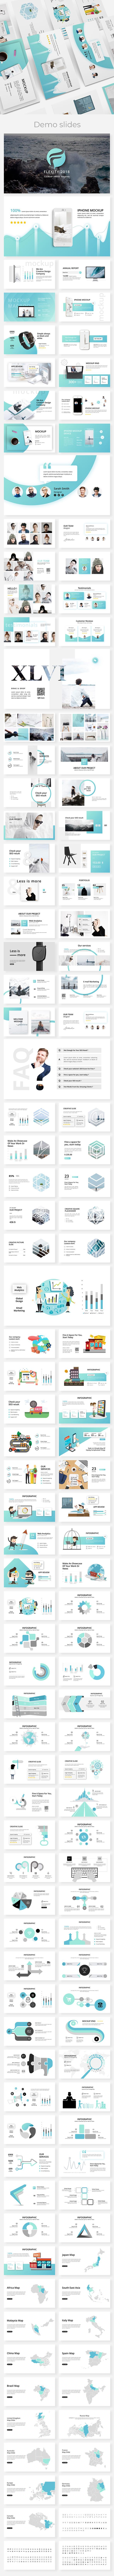 Flexity Creative Google Slide Template - Google Slides Presentation Templates